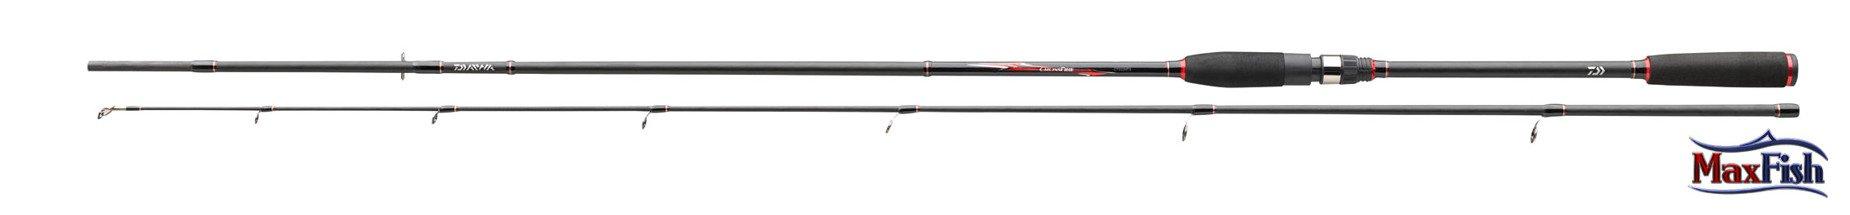 Daiwa Crossfire Jiggerspin  270cm 8-35g